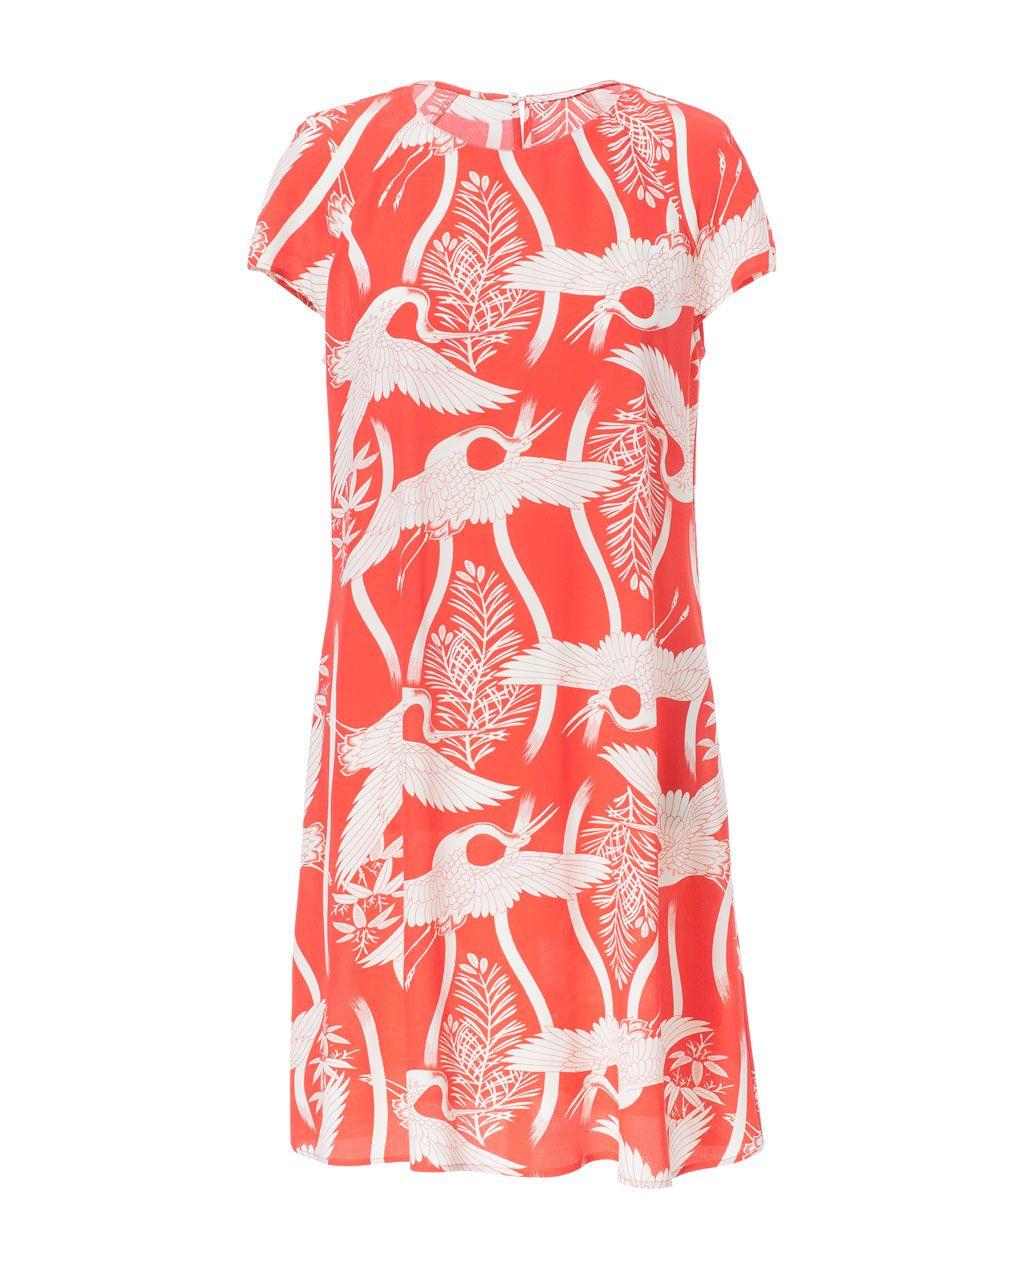 BIRD PRINT DRESS from Zara